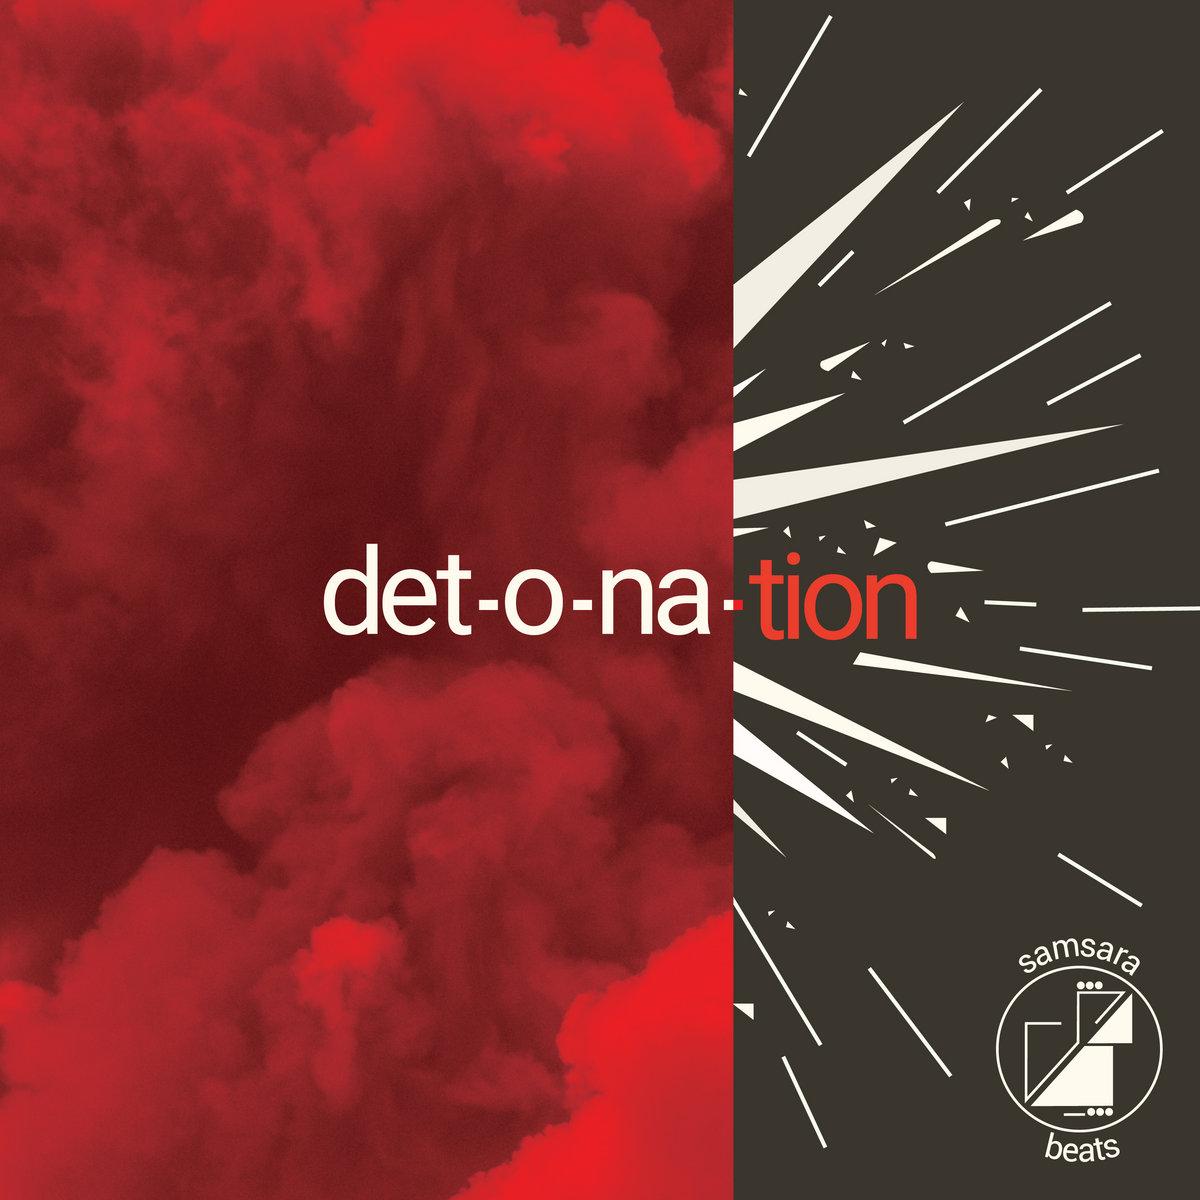 Detonation - Compilation - Samsara Beats - Bandcamp - player - 2020 - Sa Scena Sarda